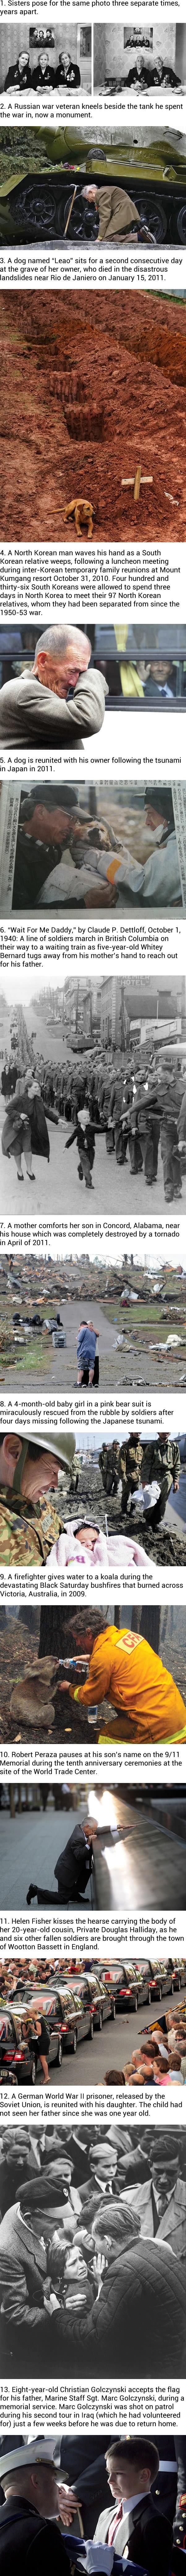 Heartbreaking photos